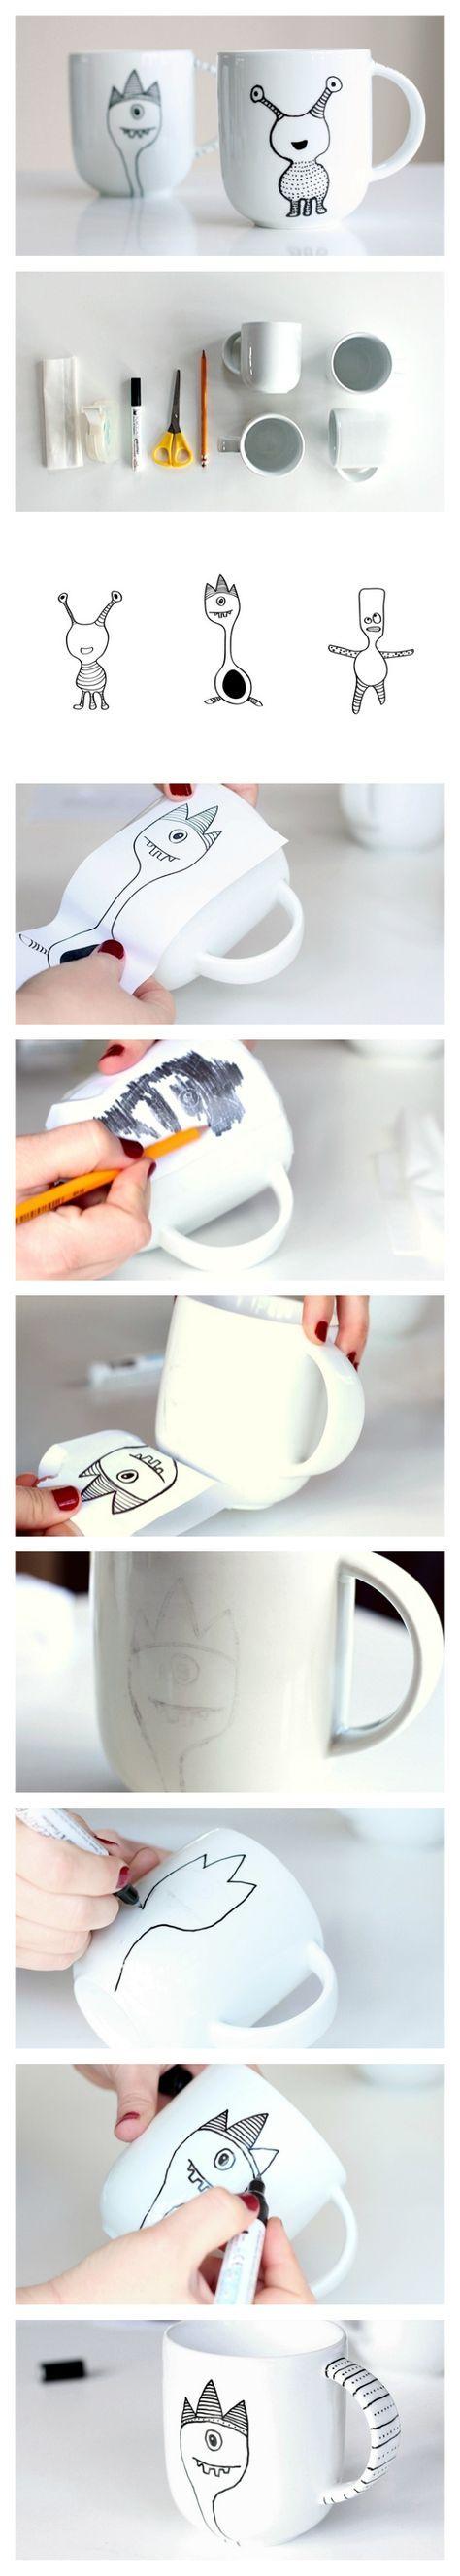 17 meilleures id es propos de tasses personnalis es sur pinterest tasses de caf. Black Bedroom Furniture Sets. Home Design Ideas